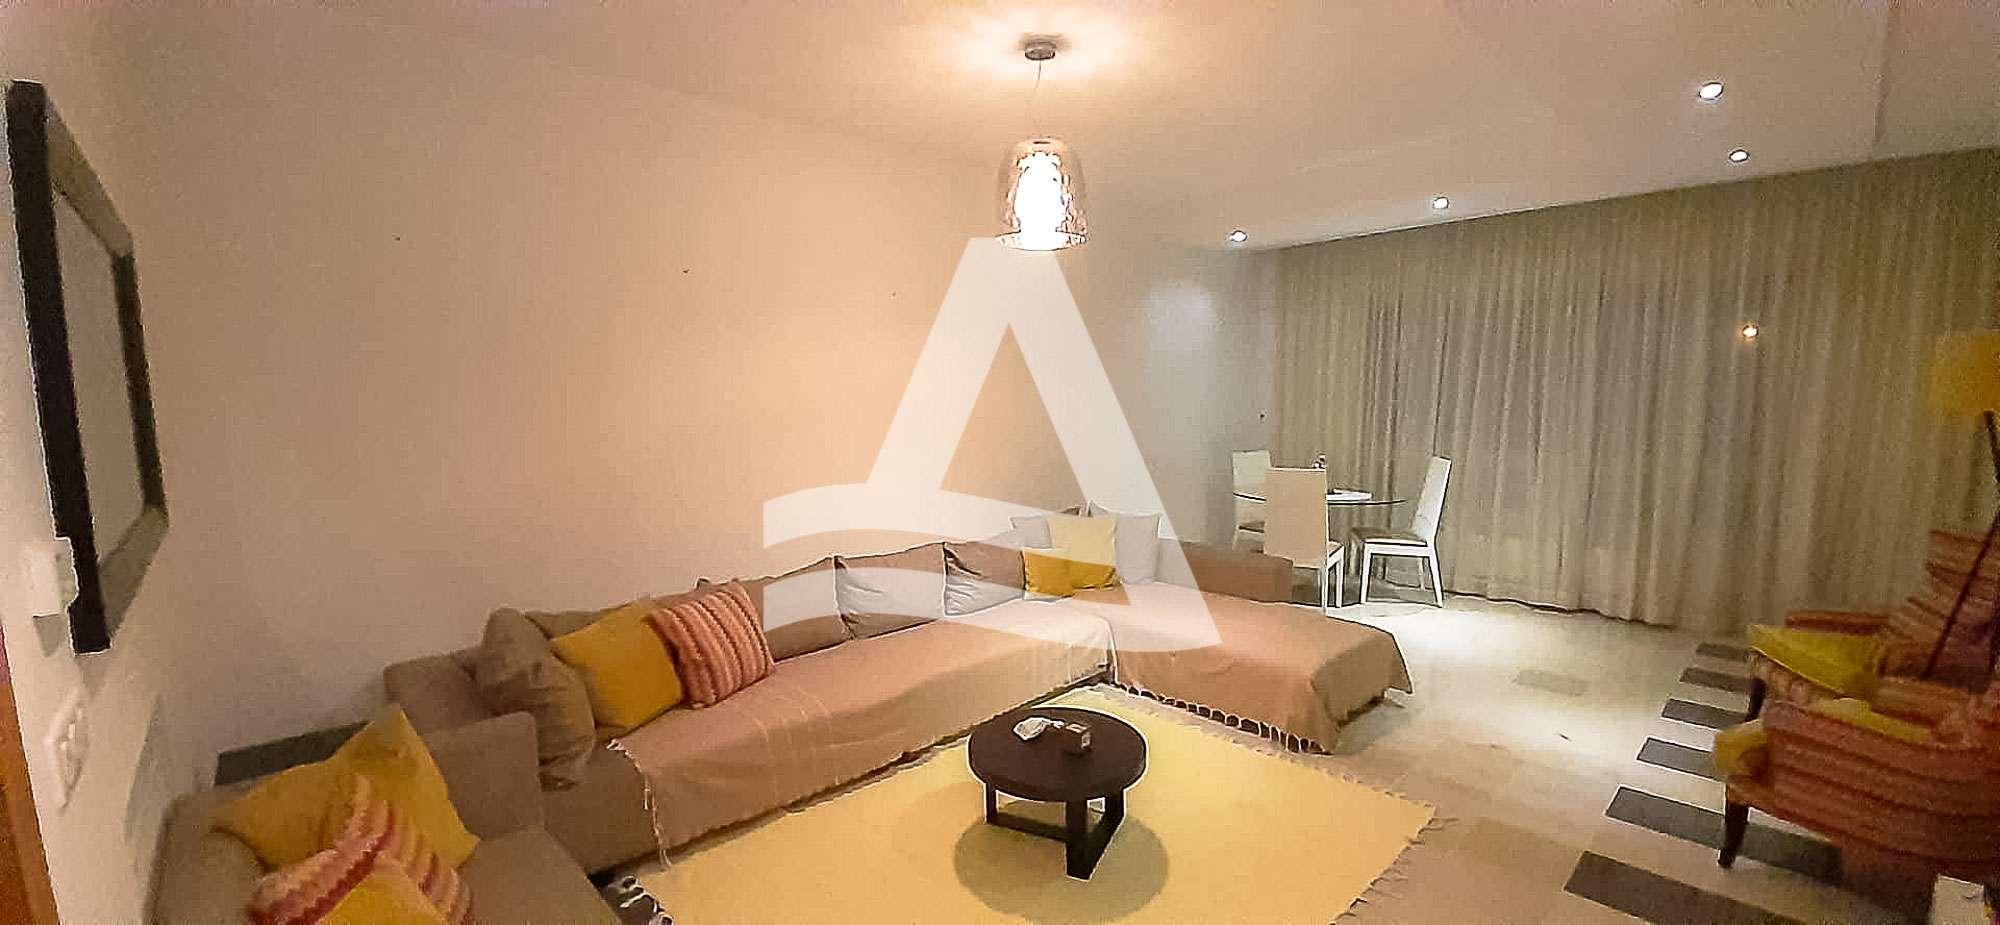 httpss3.amazonaws.comlogimoaws_Arcane_immobilière_la_Marsa-_location_-_vente_la_marsa_1_sur_12_1574867274113